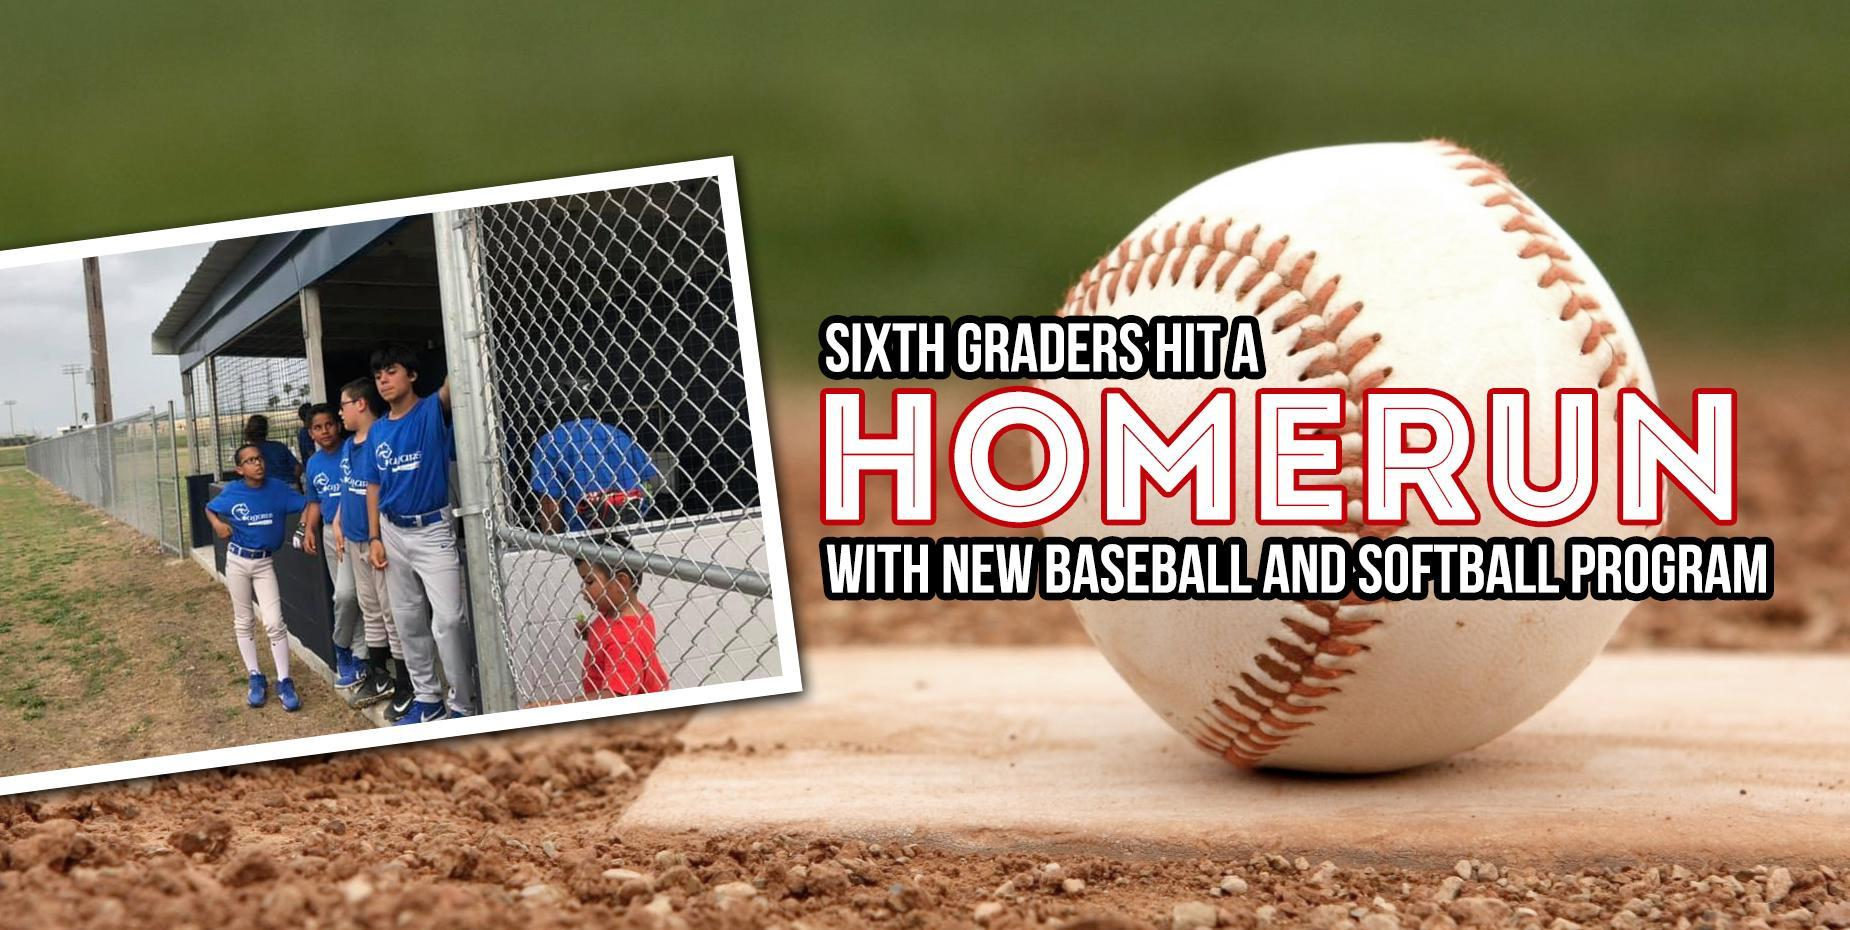 Sixth Graders Hit A Homerun with Baseball and Softball Program